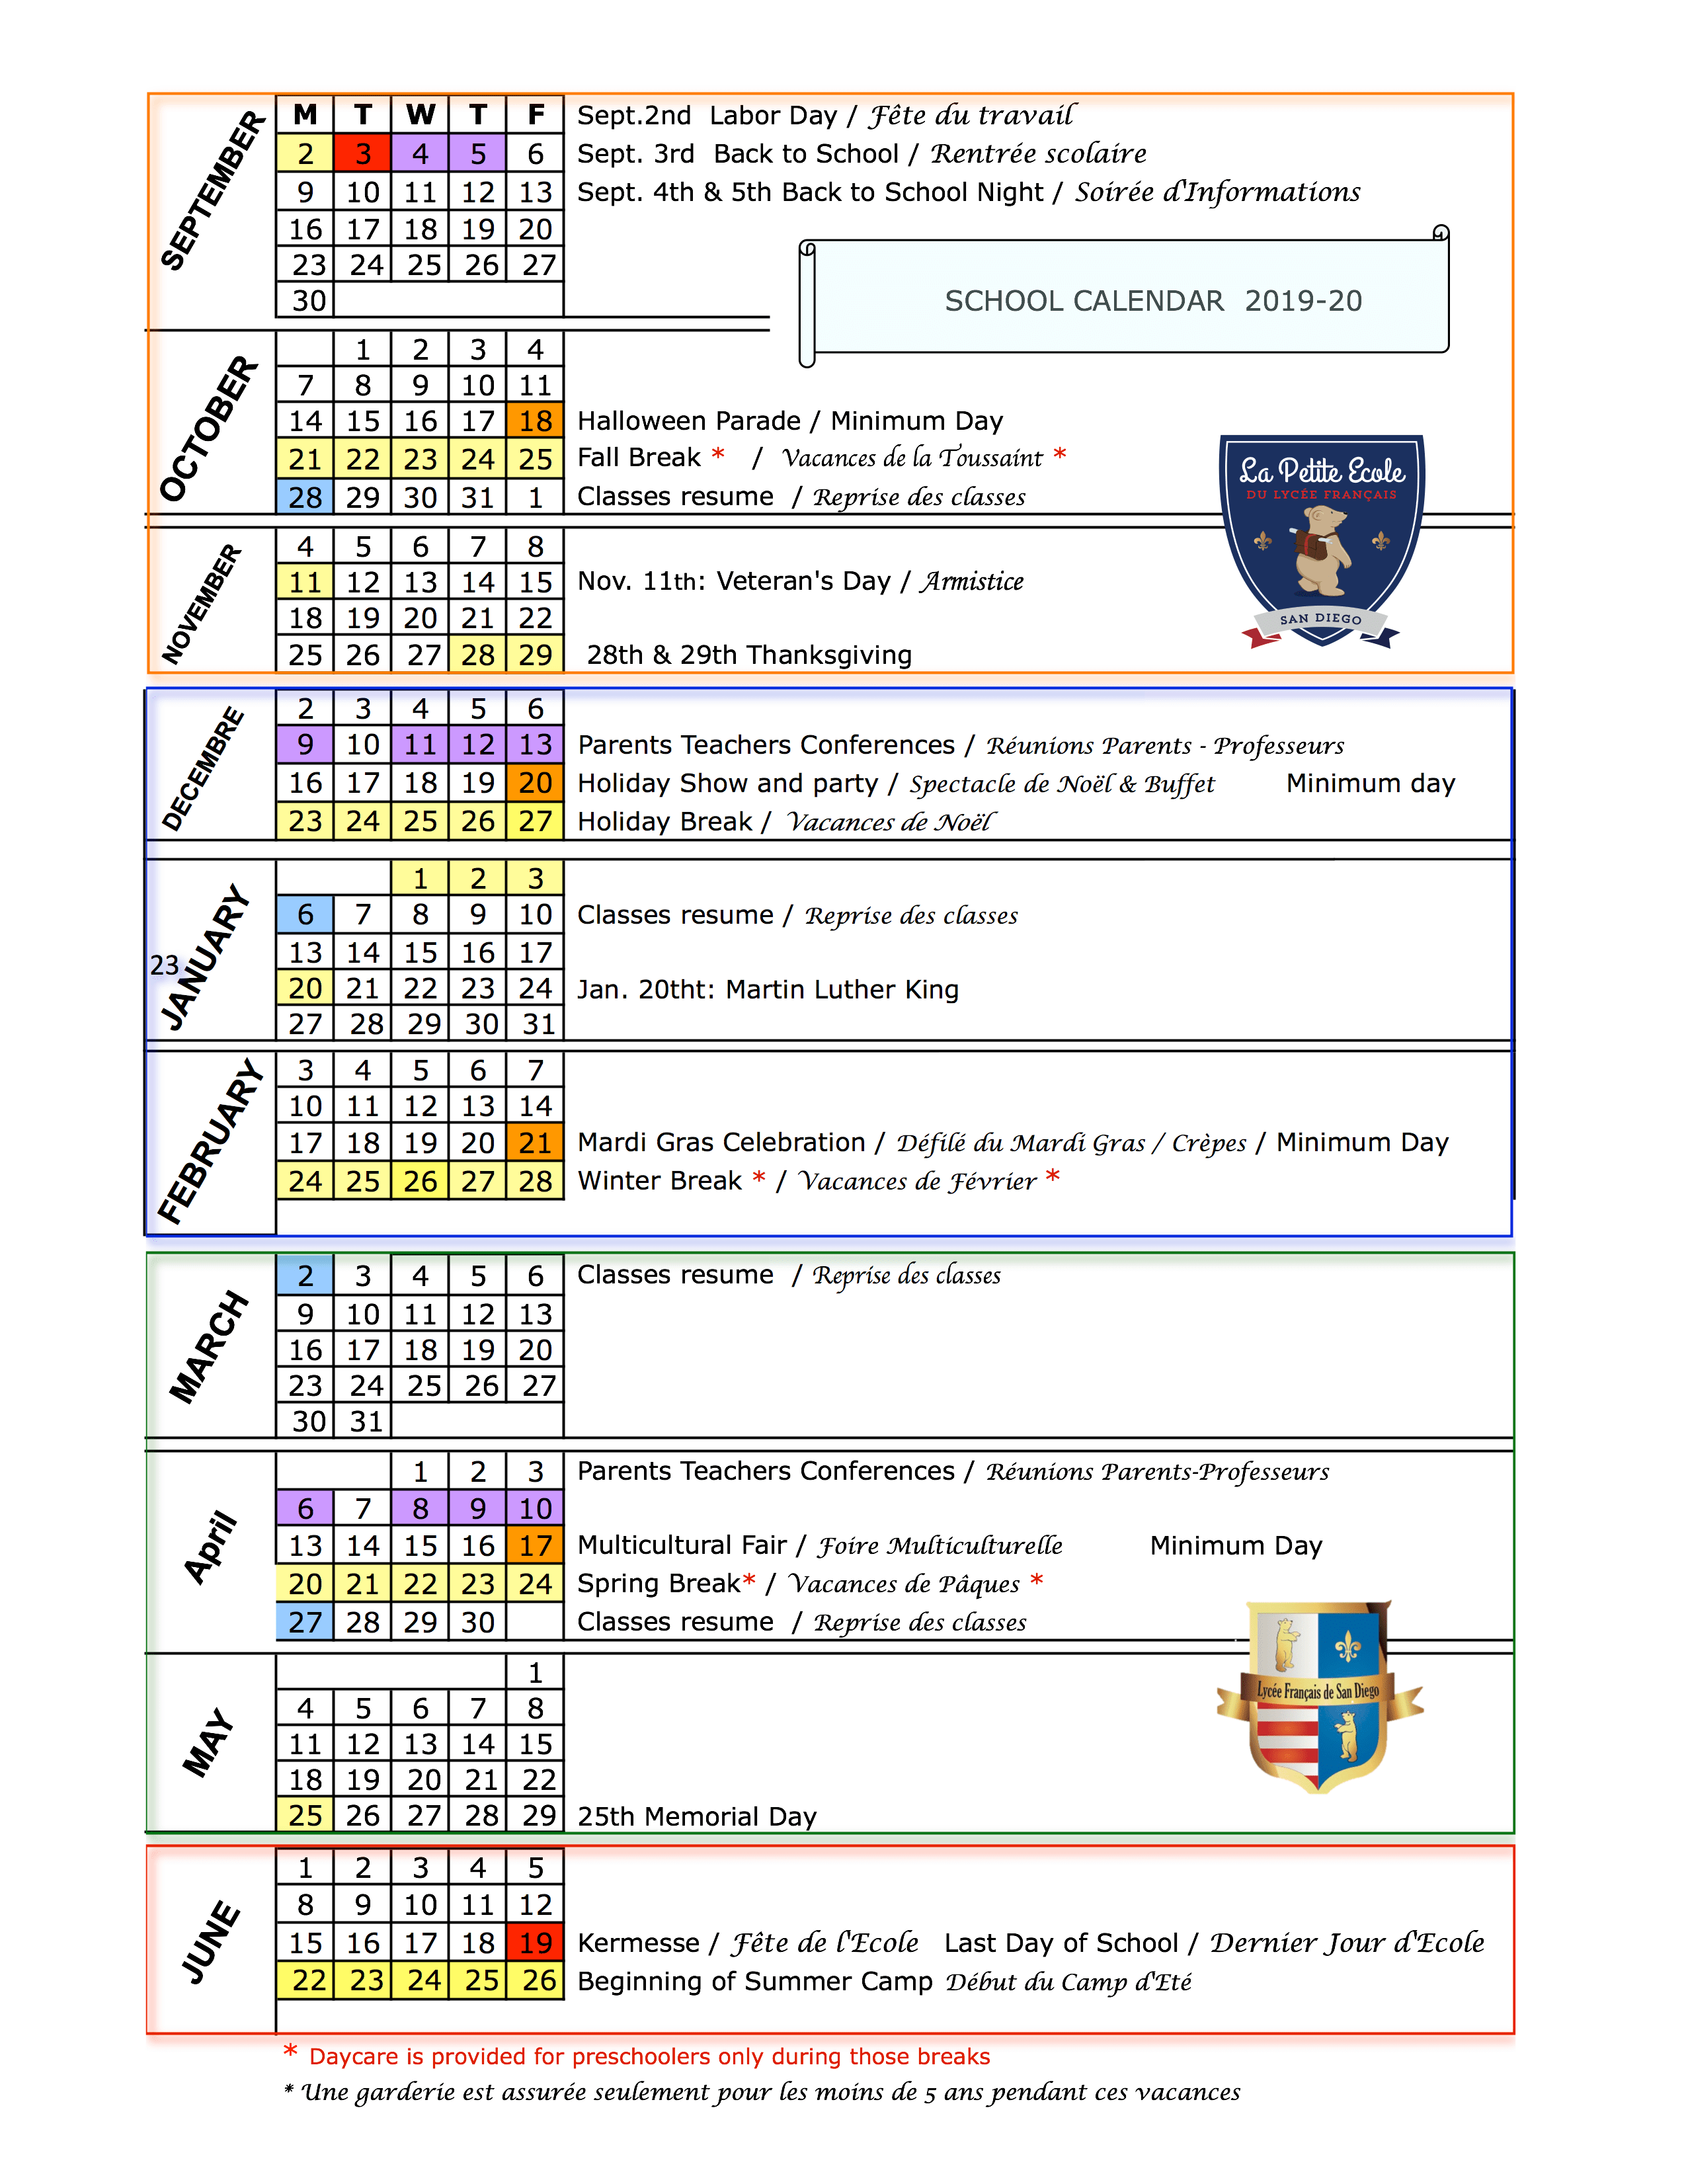 School Calendar 2019 20 & 2020 21 | Le Lycée Français De San In San Diego High School Calendar 2021